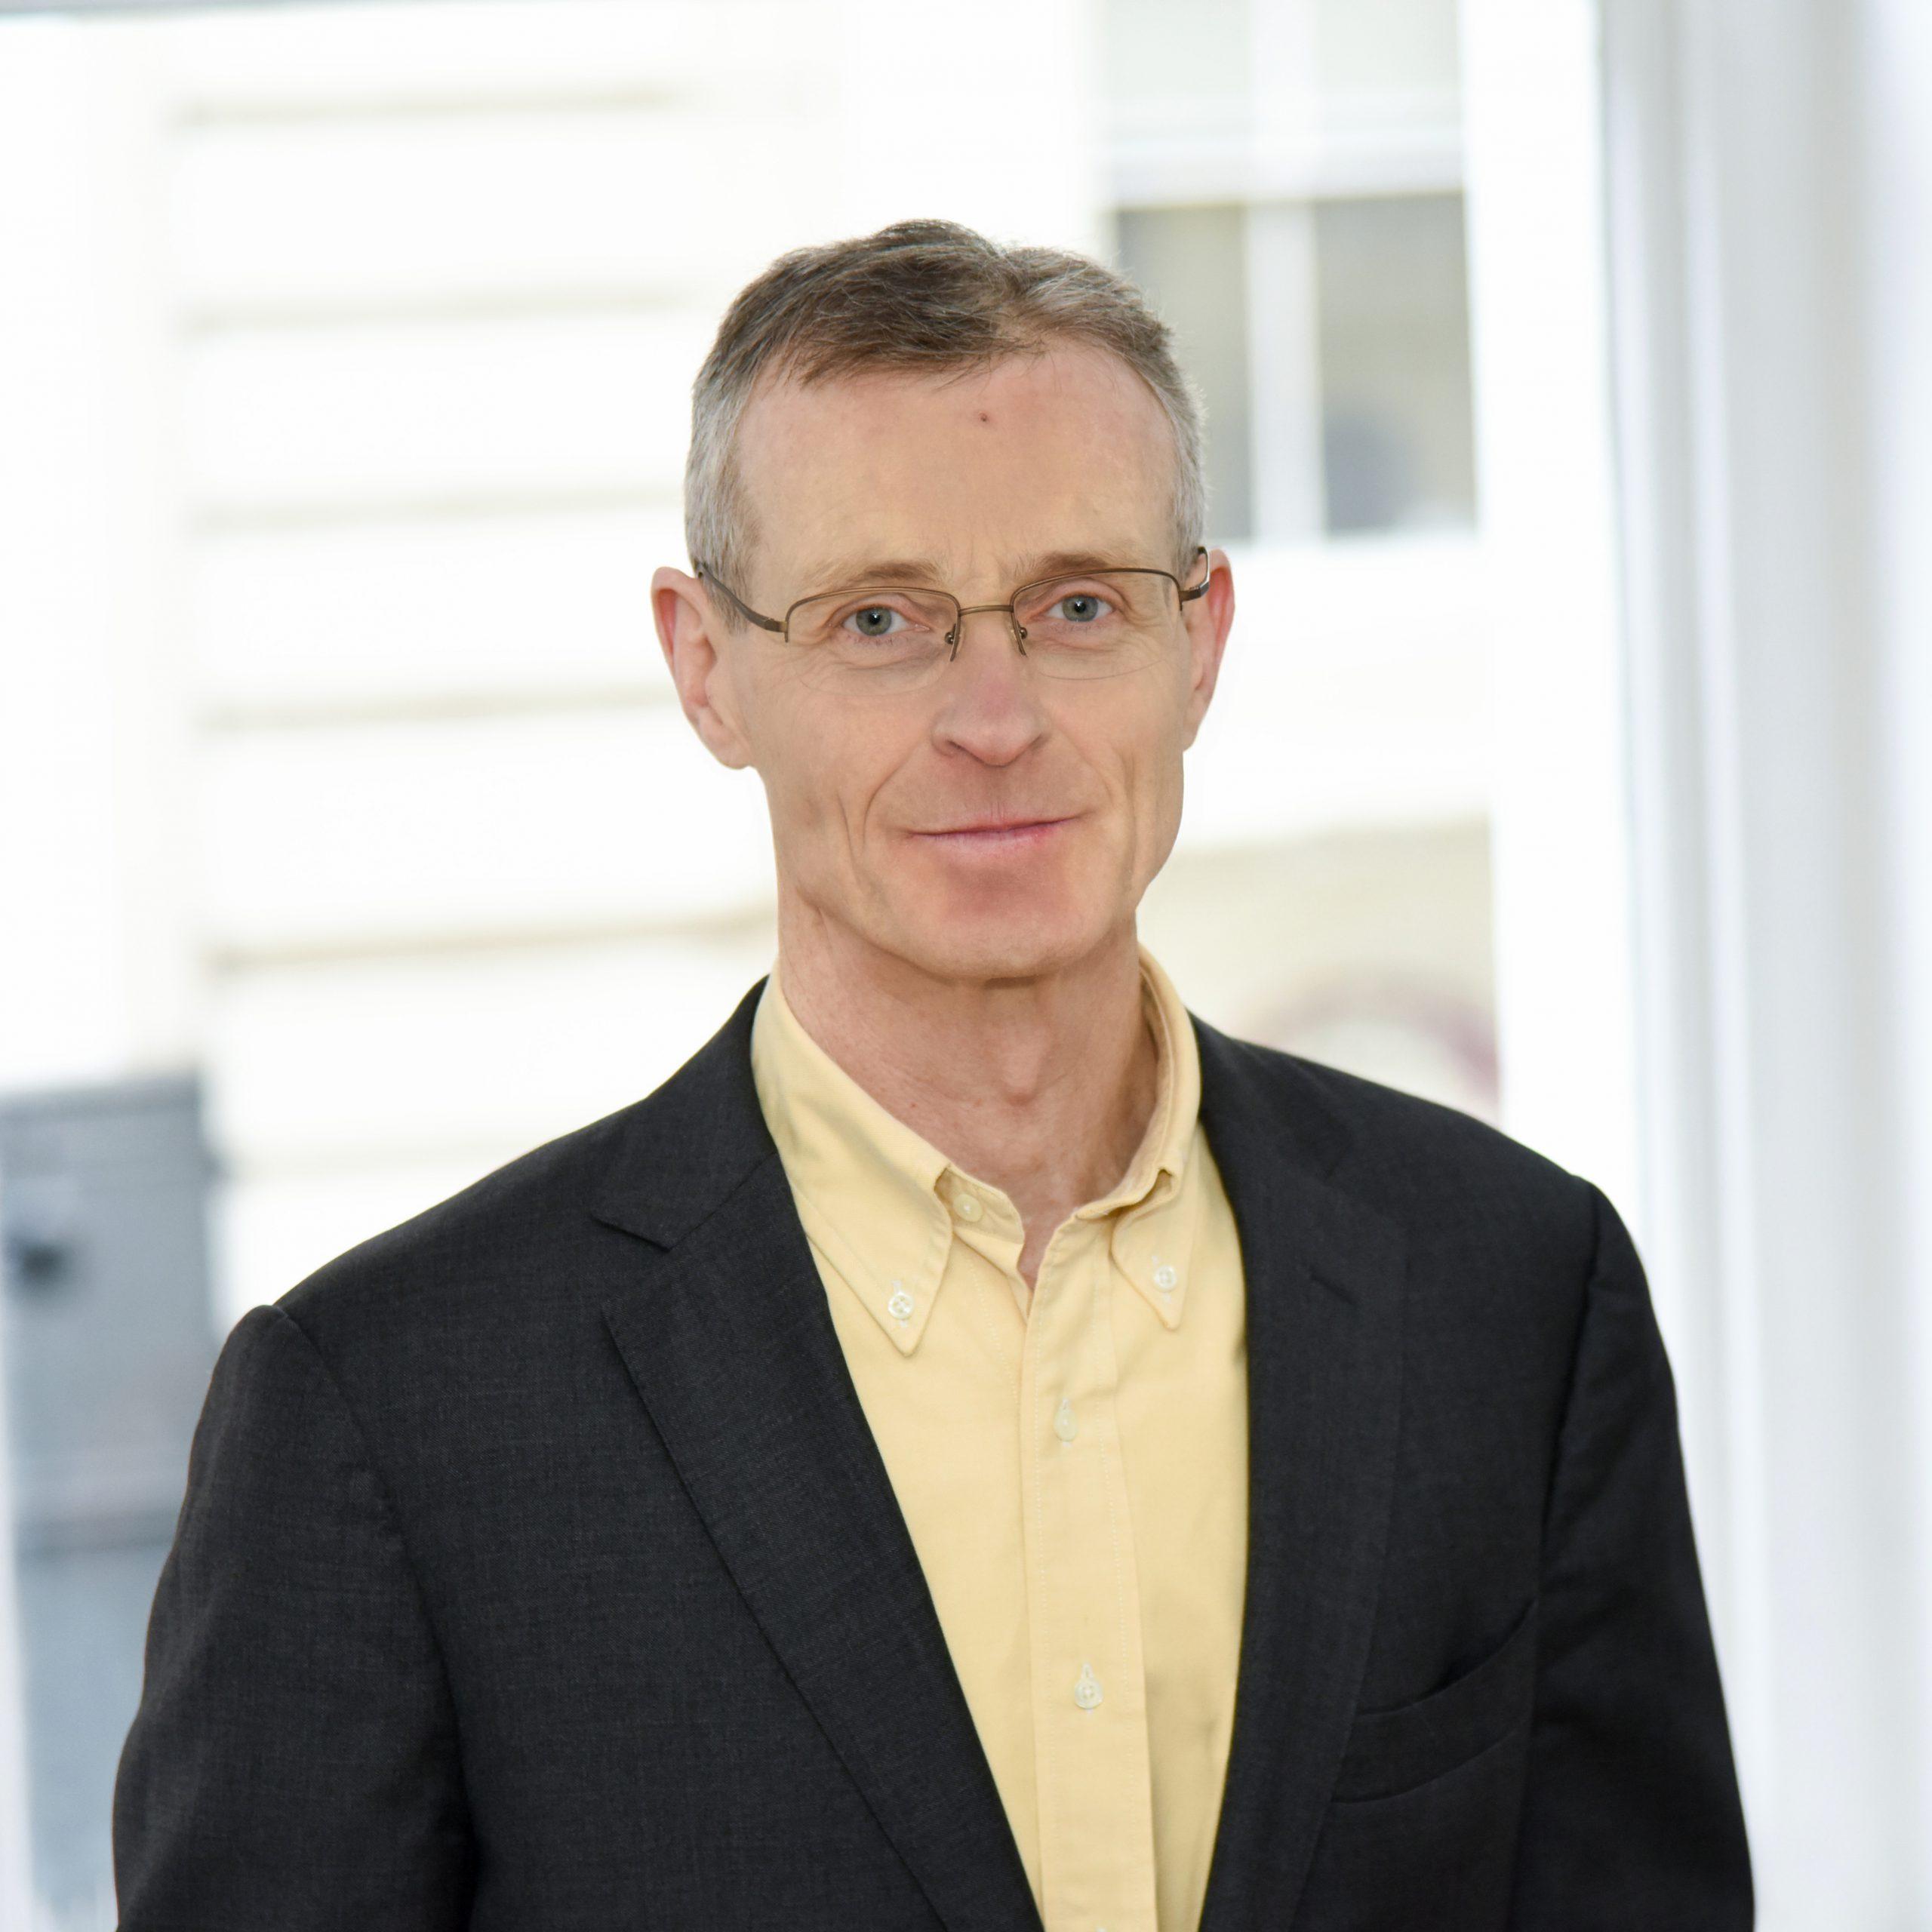 Stephen Palmer BA, MSc (Econ)